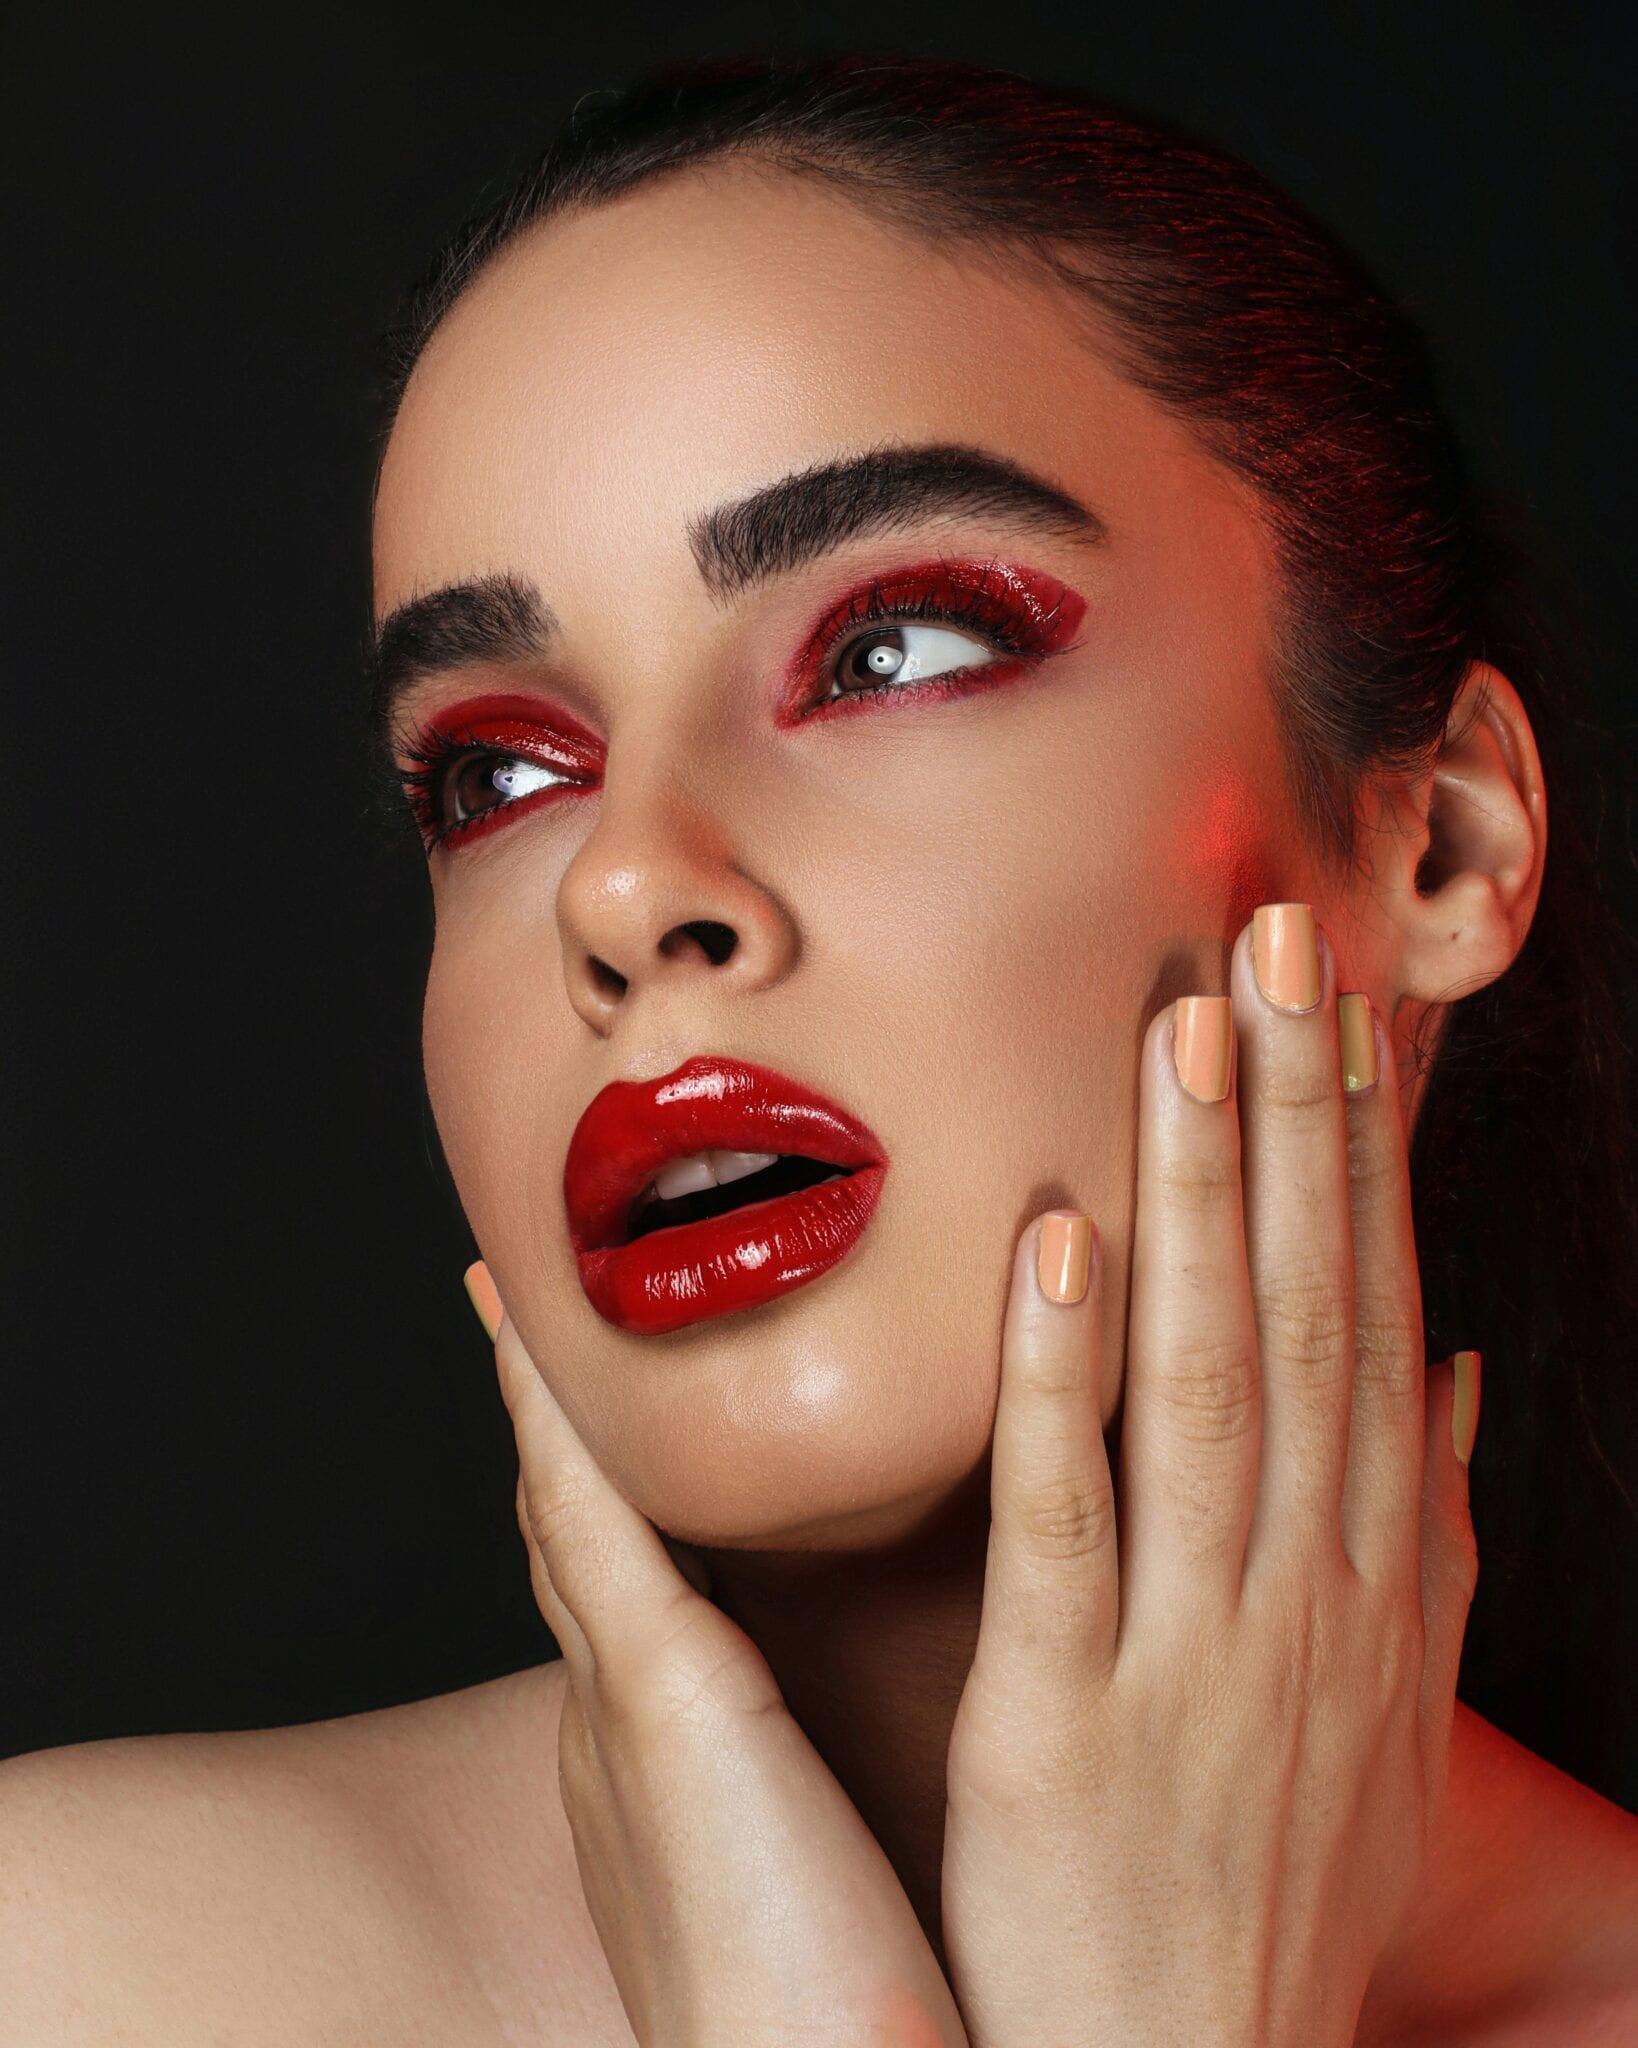 Lipstick girl, photo by nojan namdar, unsplash